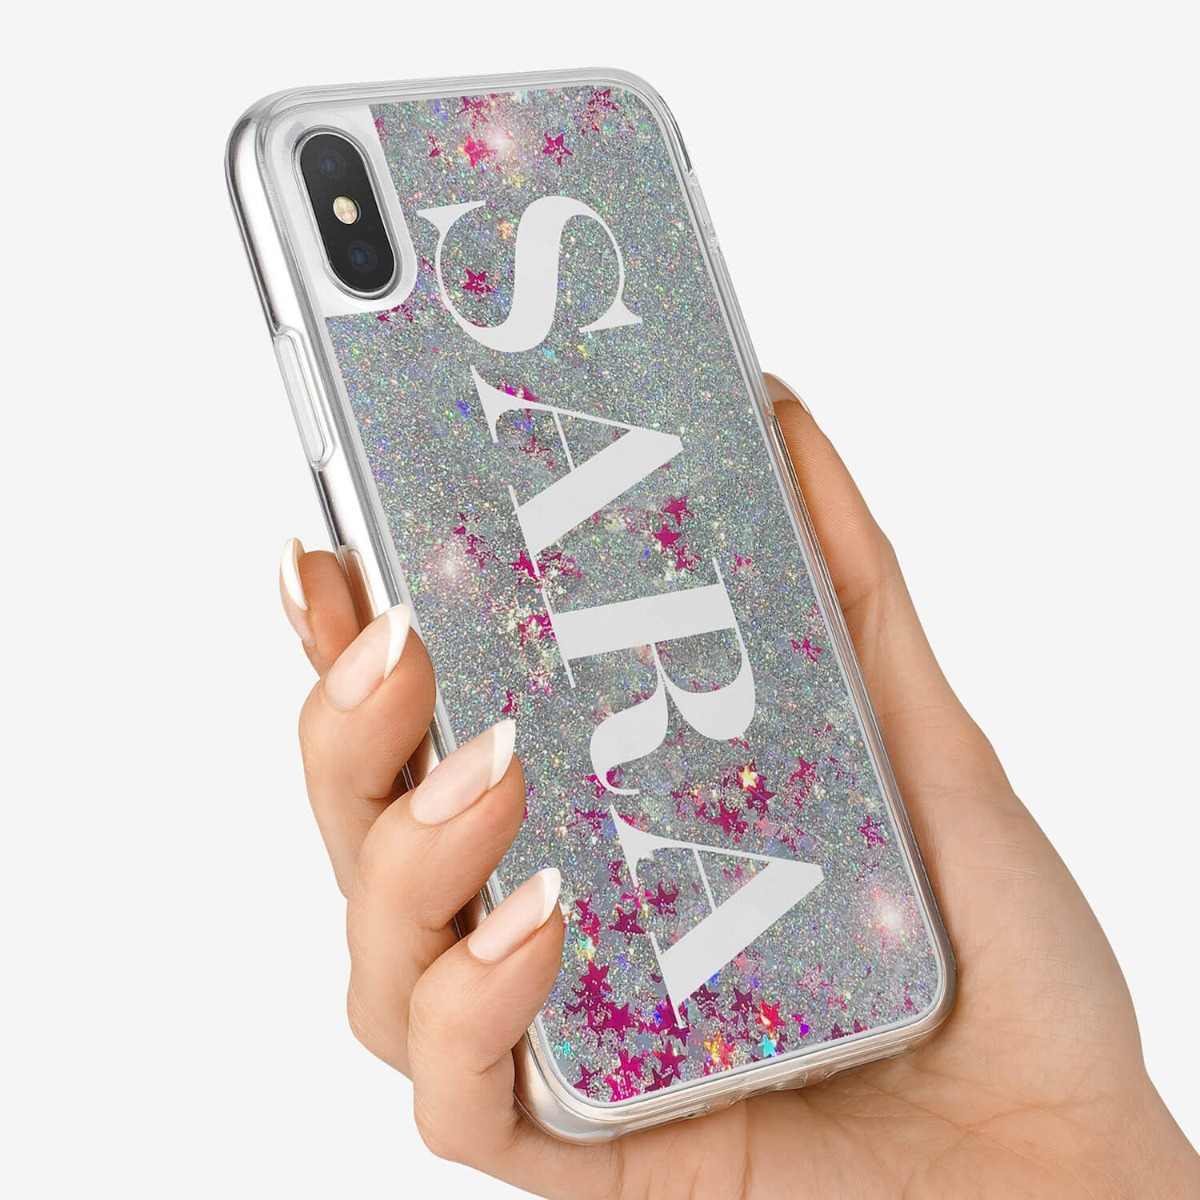 Galaxy S8 Glitter Case 16234